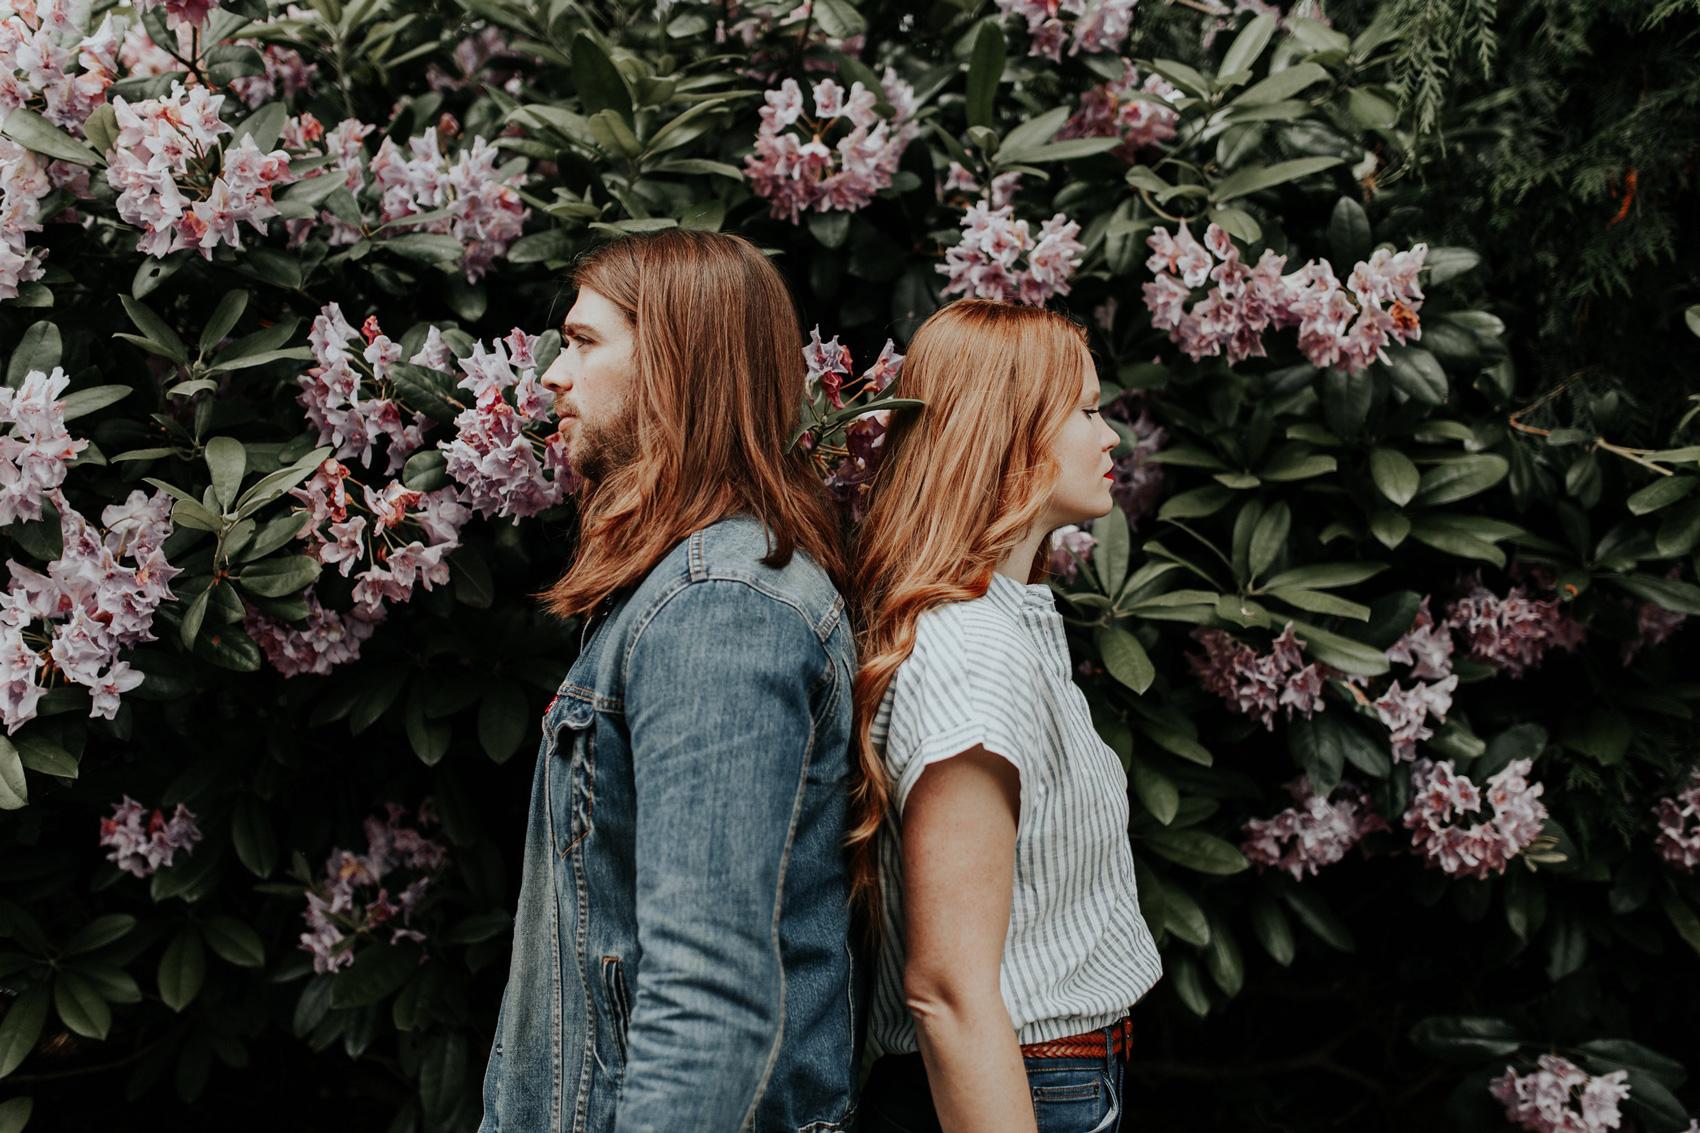 Adolescens